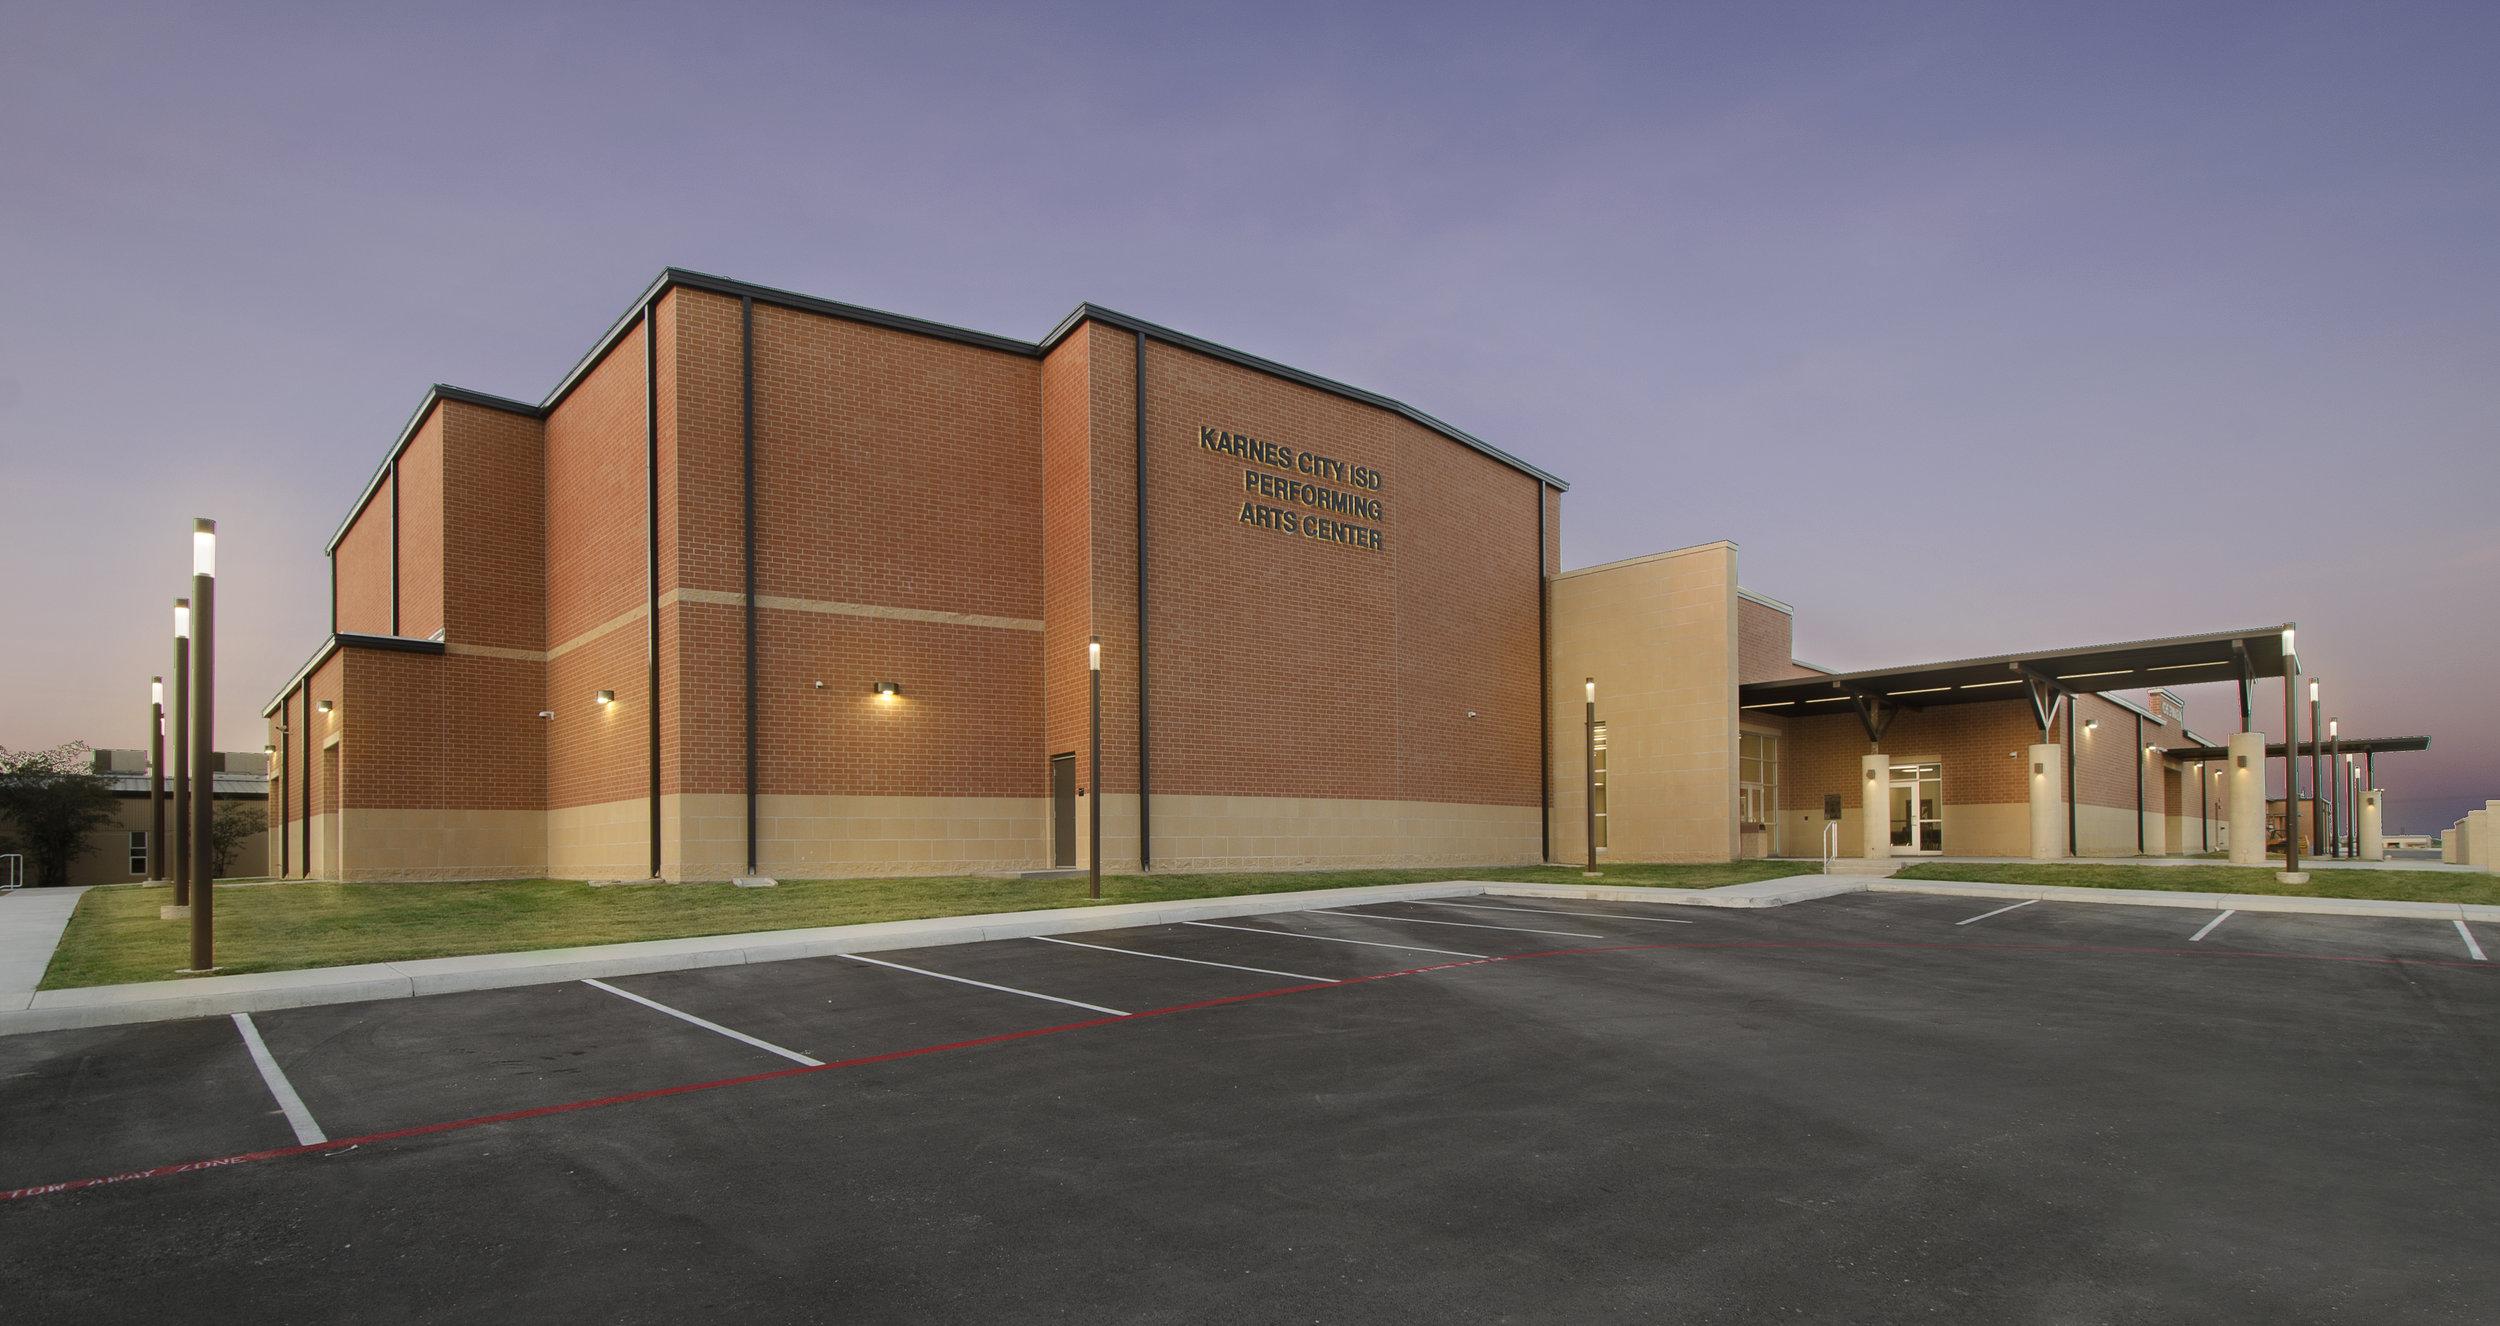 Karnes City Performing Arts Center